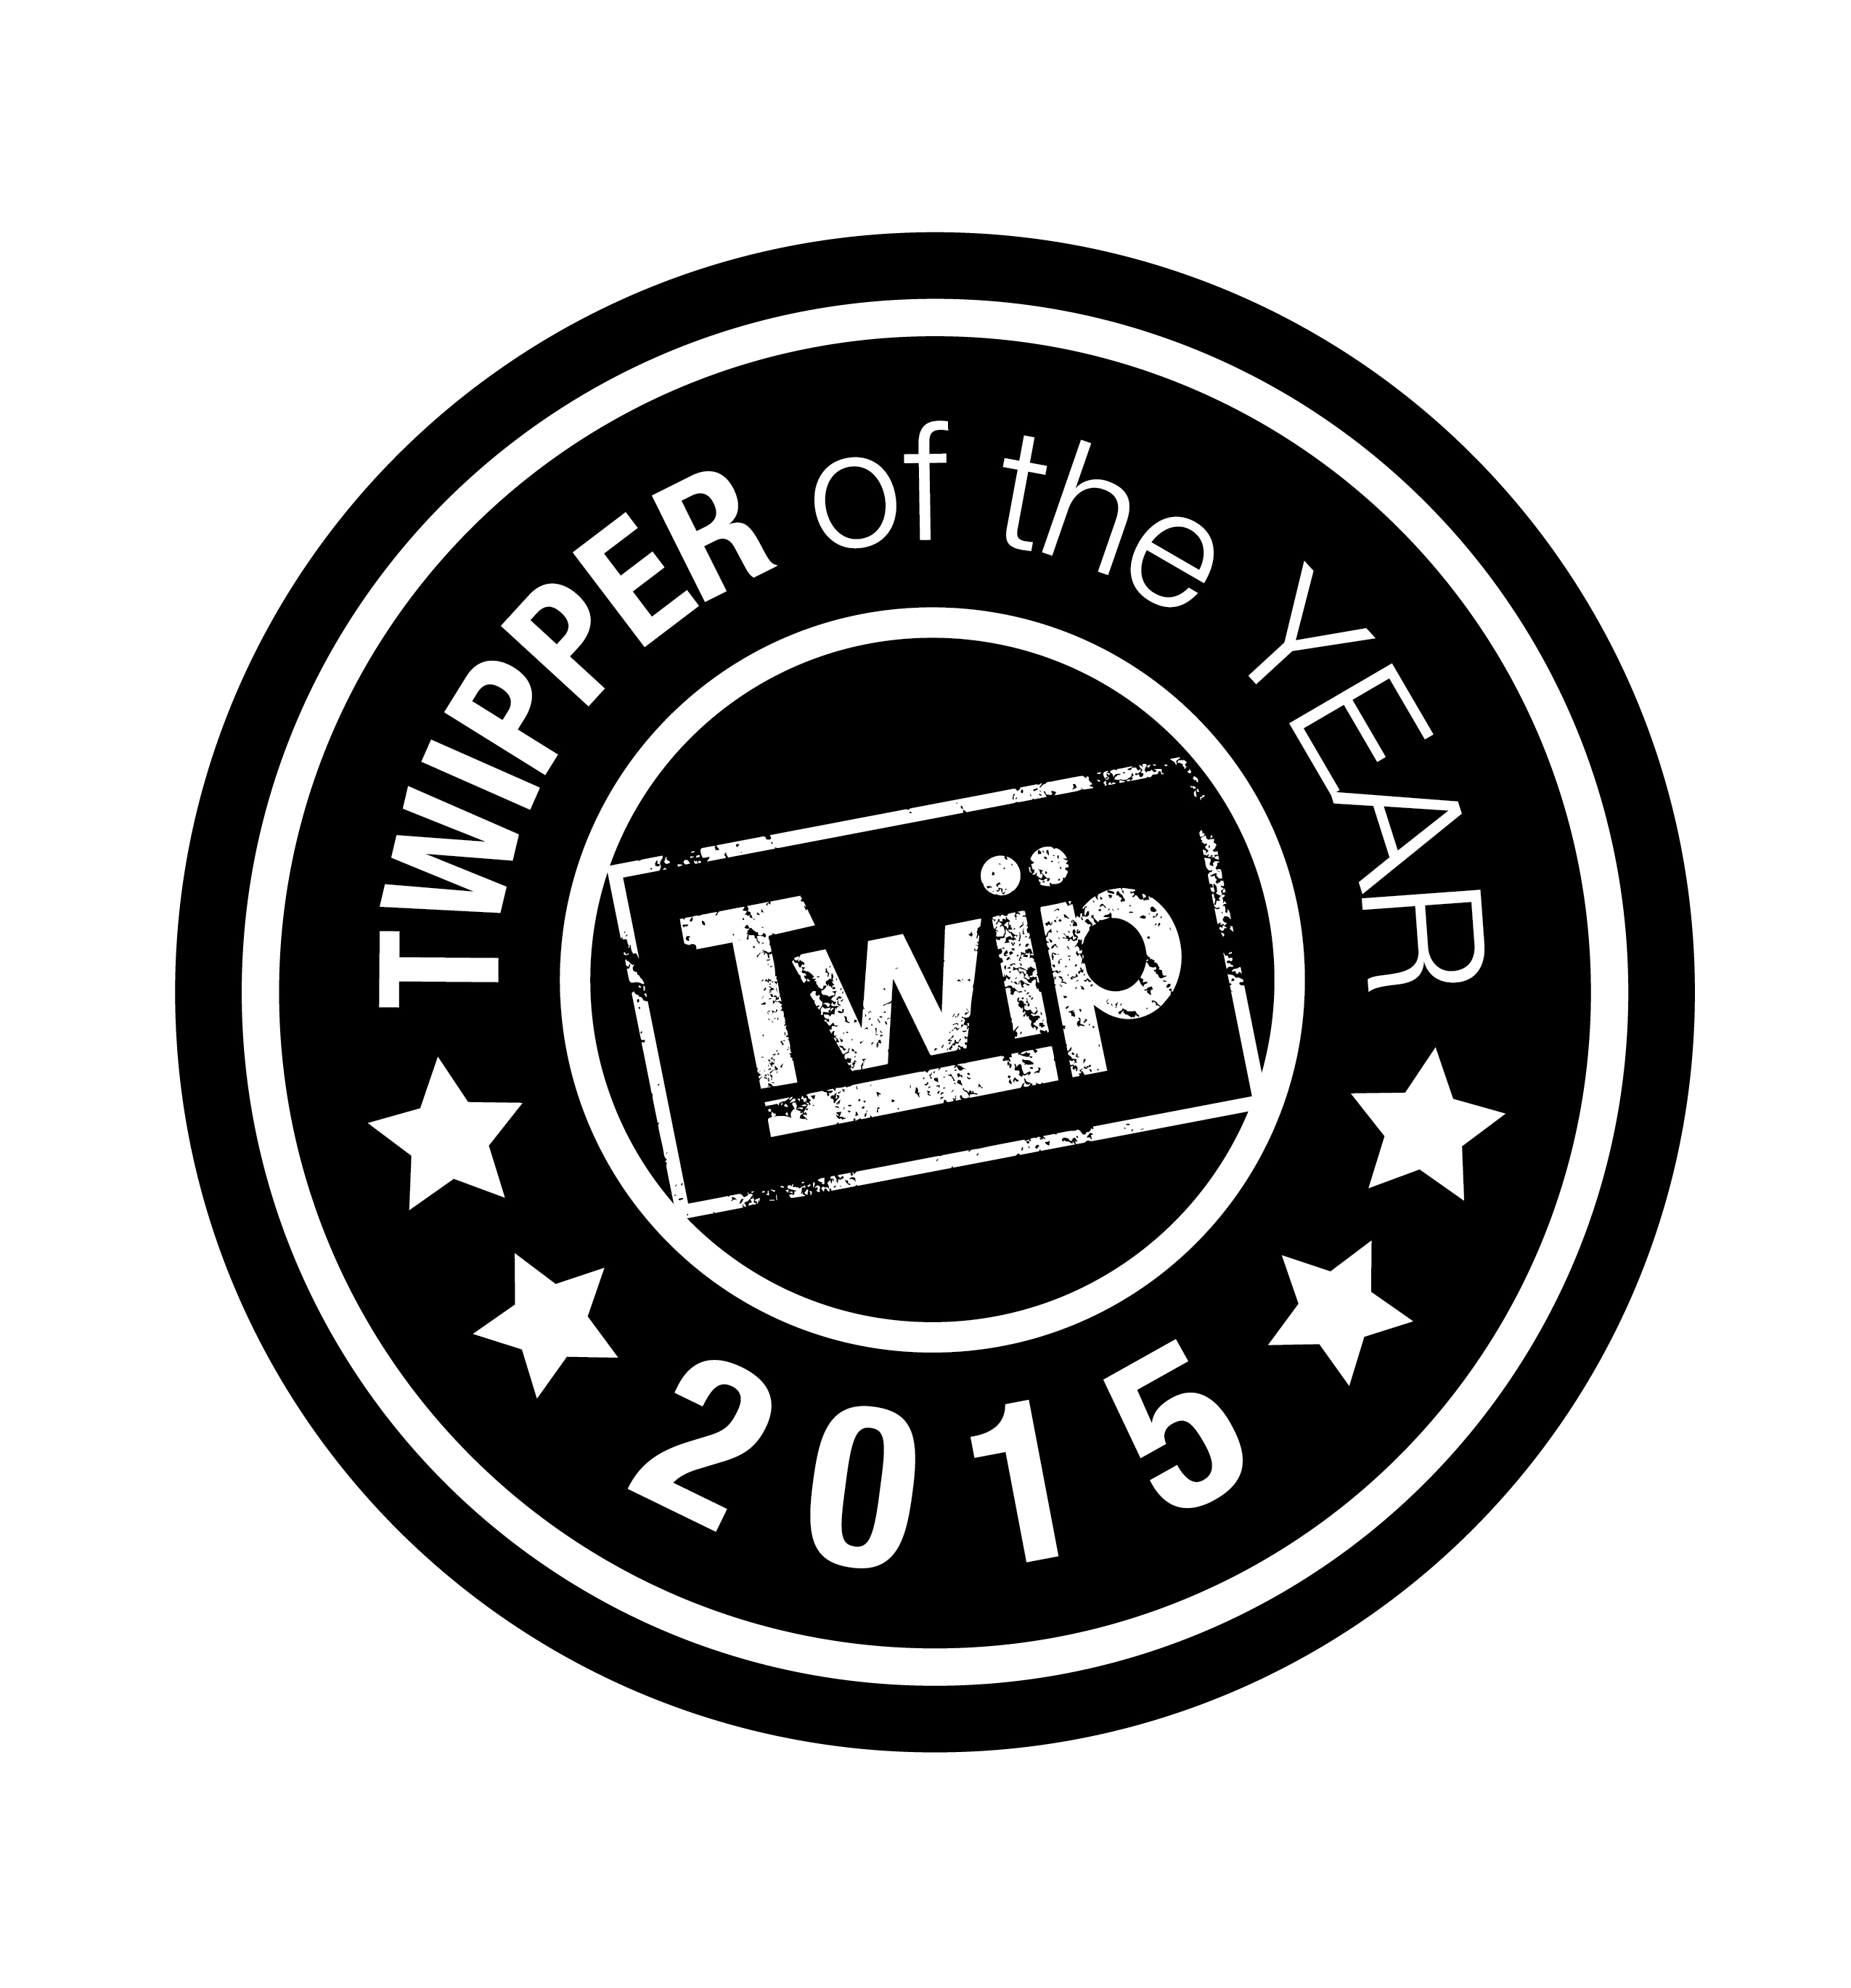 Twipper of the Year 2015 Seal Kopie